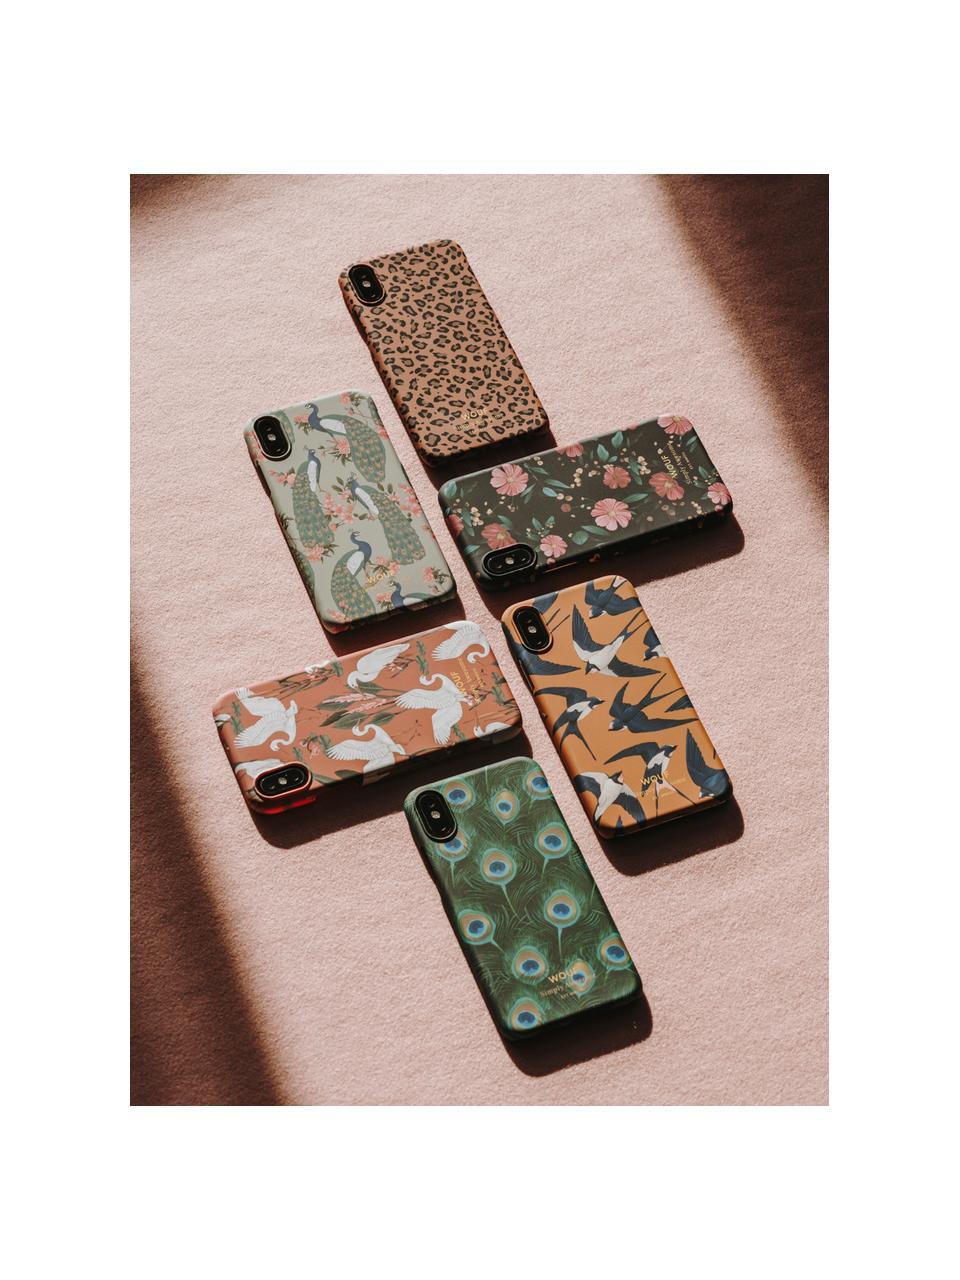 Hülle Royal Forest für iPhone X, Silikon, Mintgrün, Mehrfarbig, 7 x 15 cm